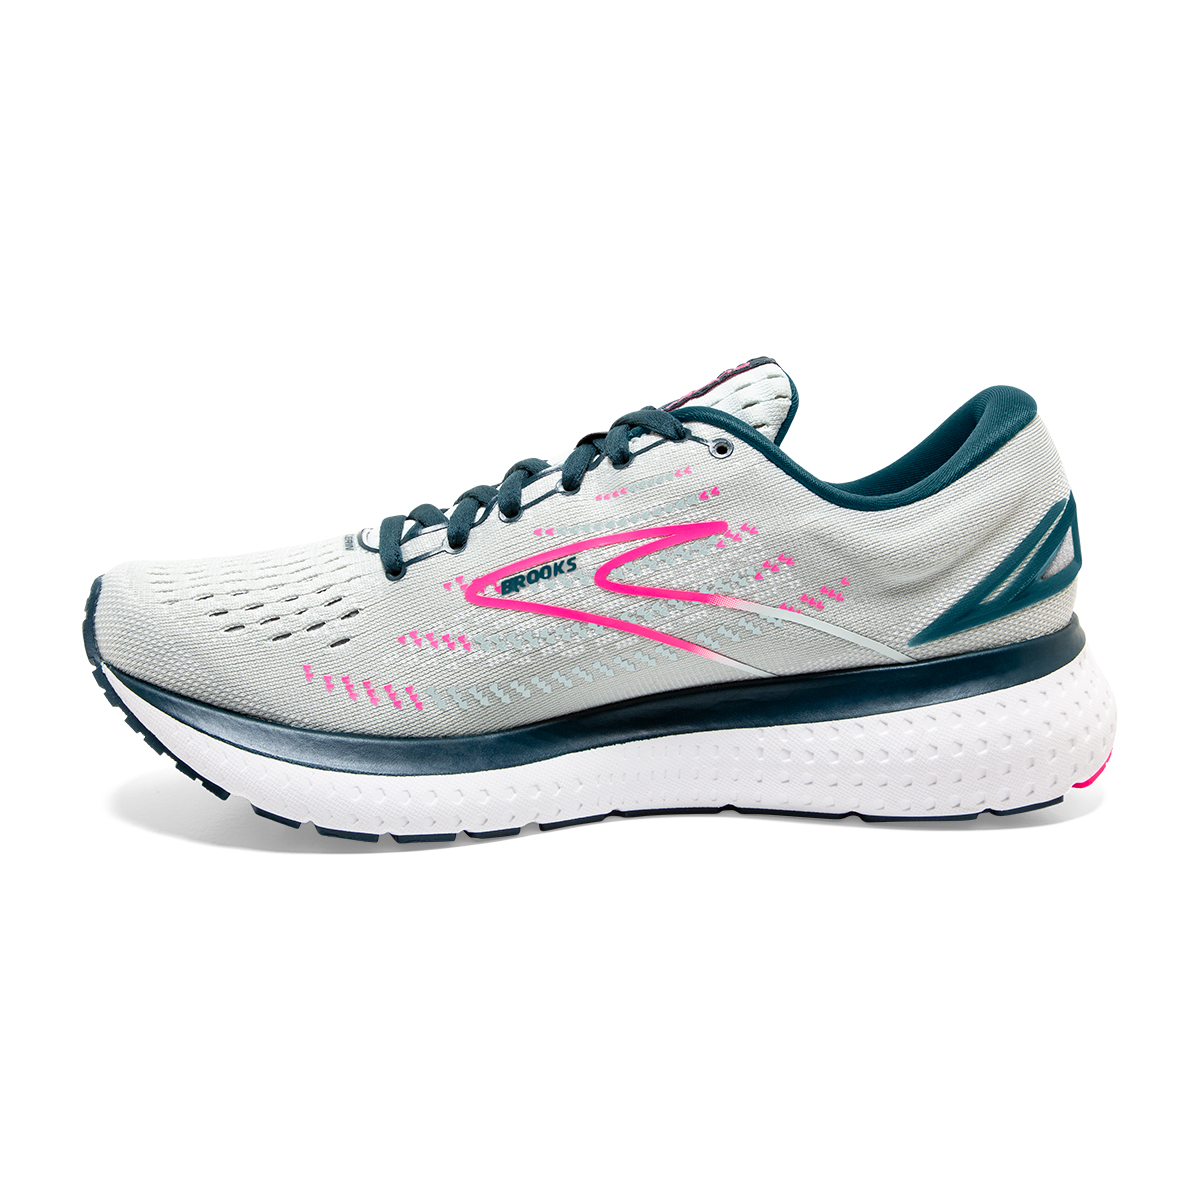 Women's Brooks Glycerin 19 Running Shoe - Color: Ice Flow/Navy - Size: 5 - Width: Regular, Ice Flow/Navy, large, image 5